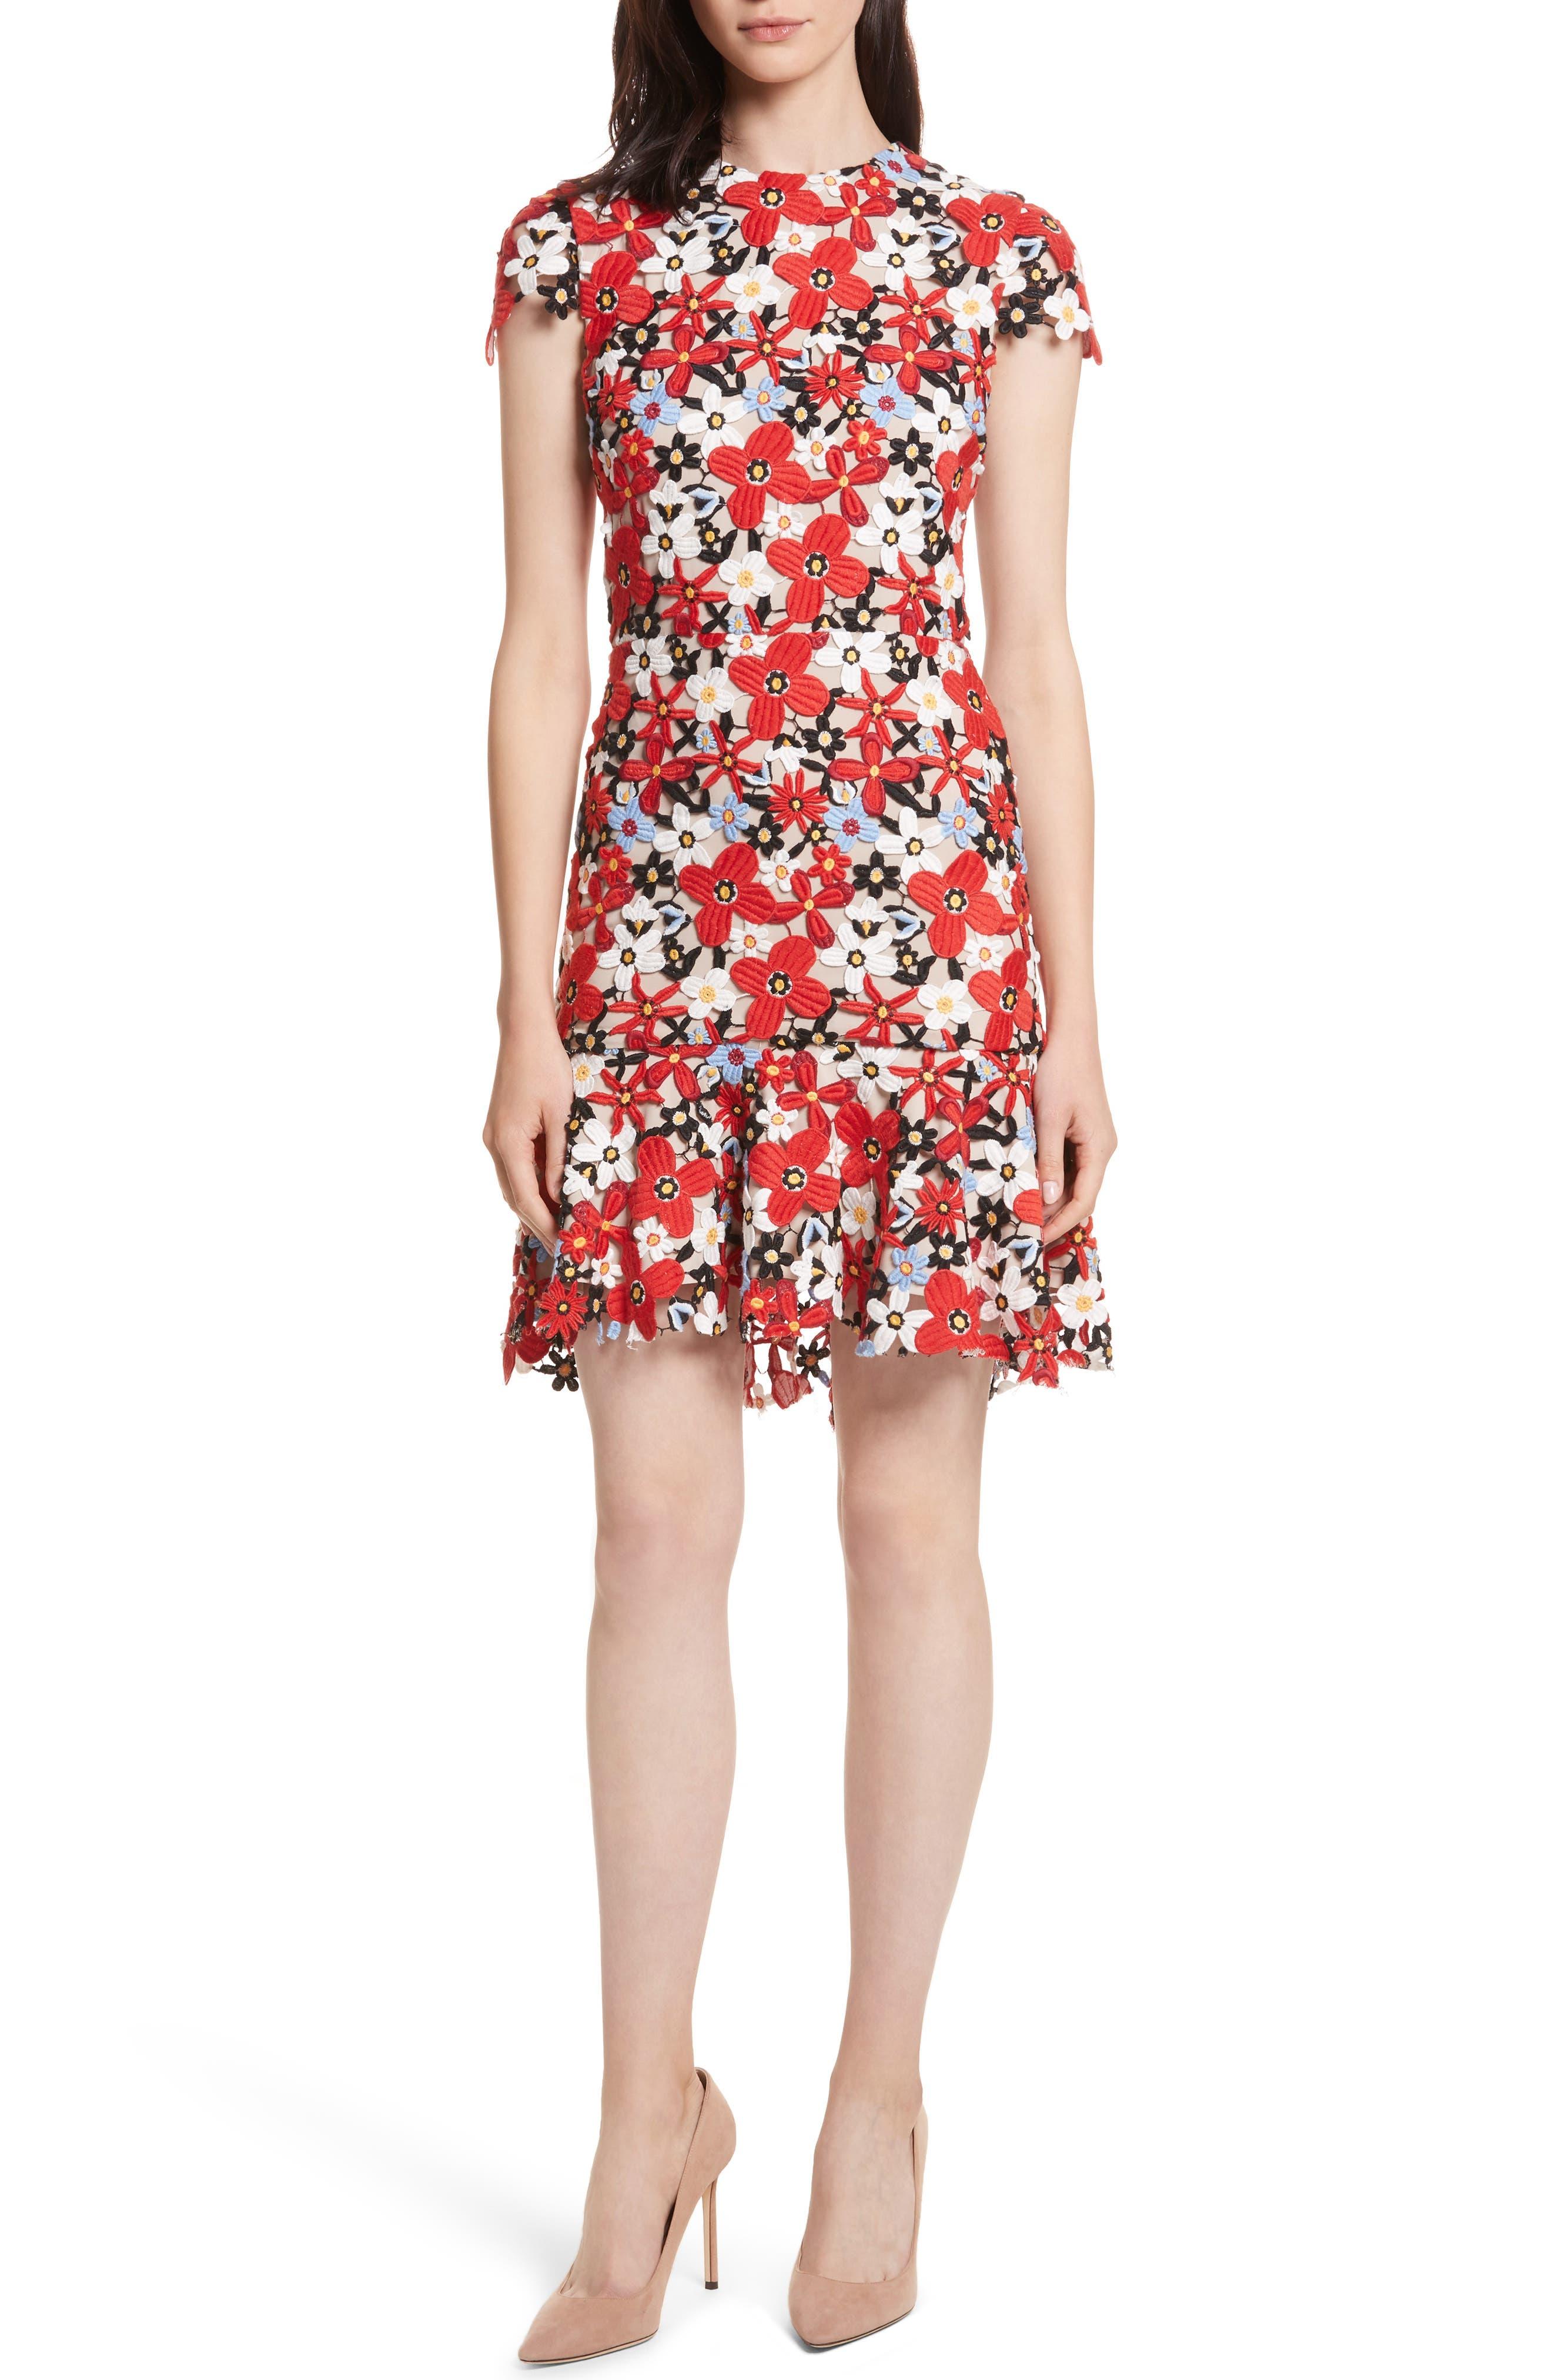 Alternate Image 1 Selected - Alice + Olivia Imani Floral Fit & Flare Dress